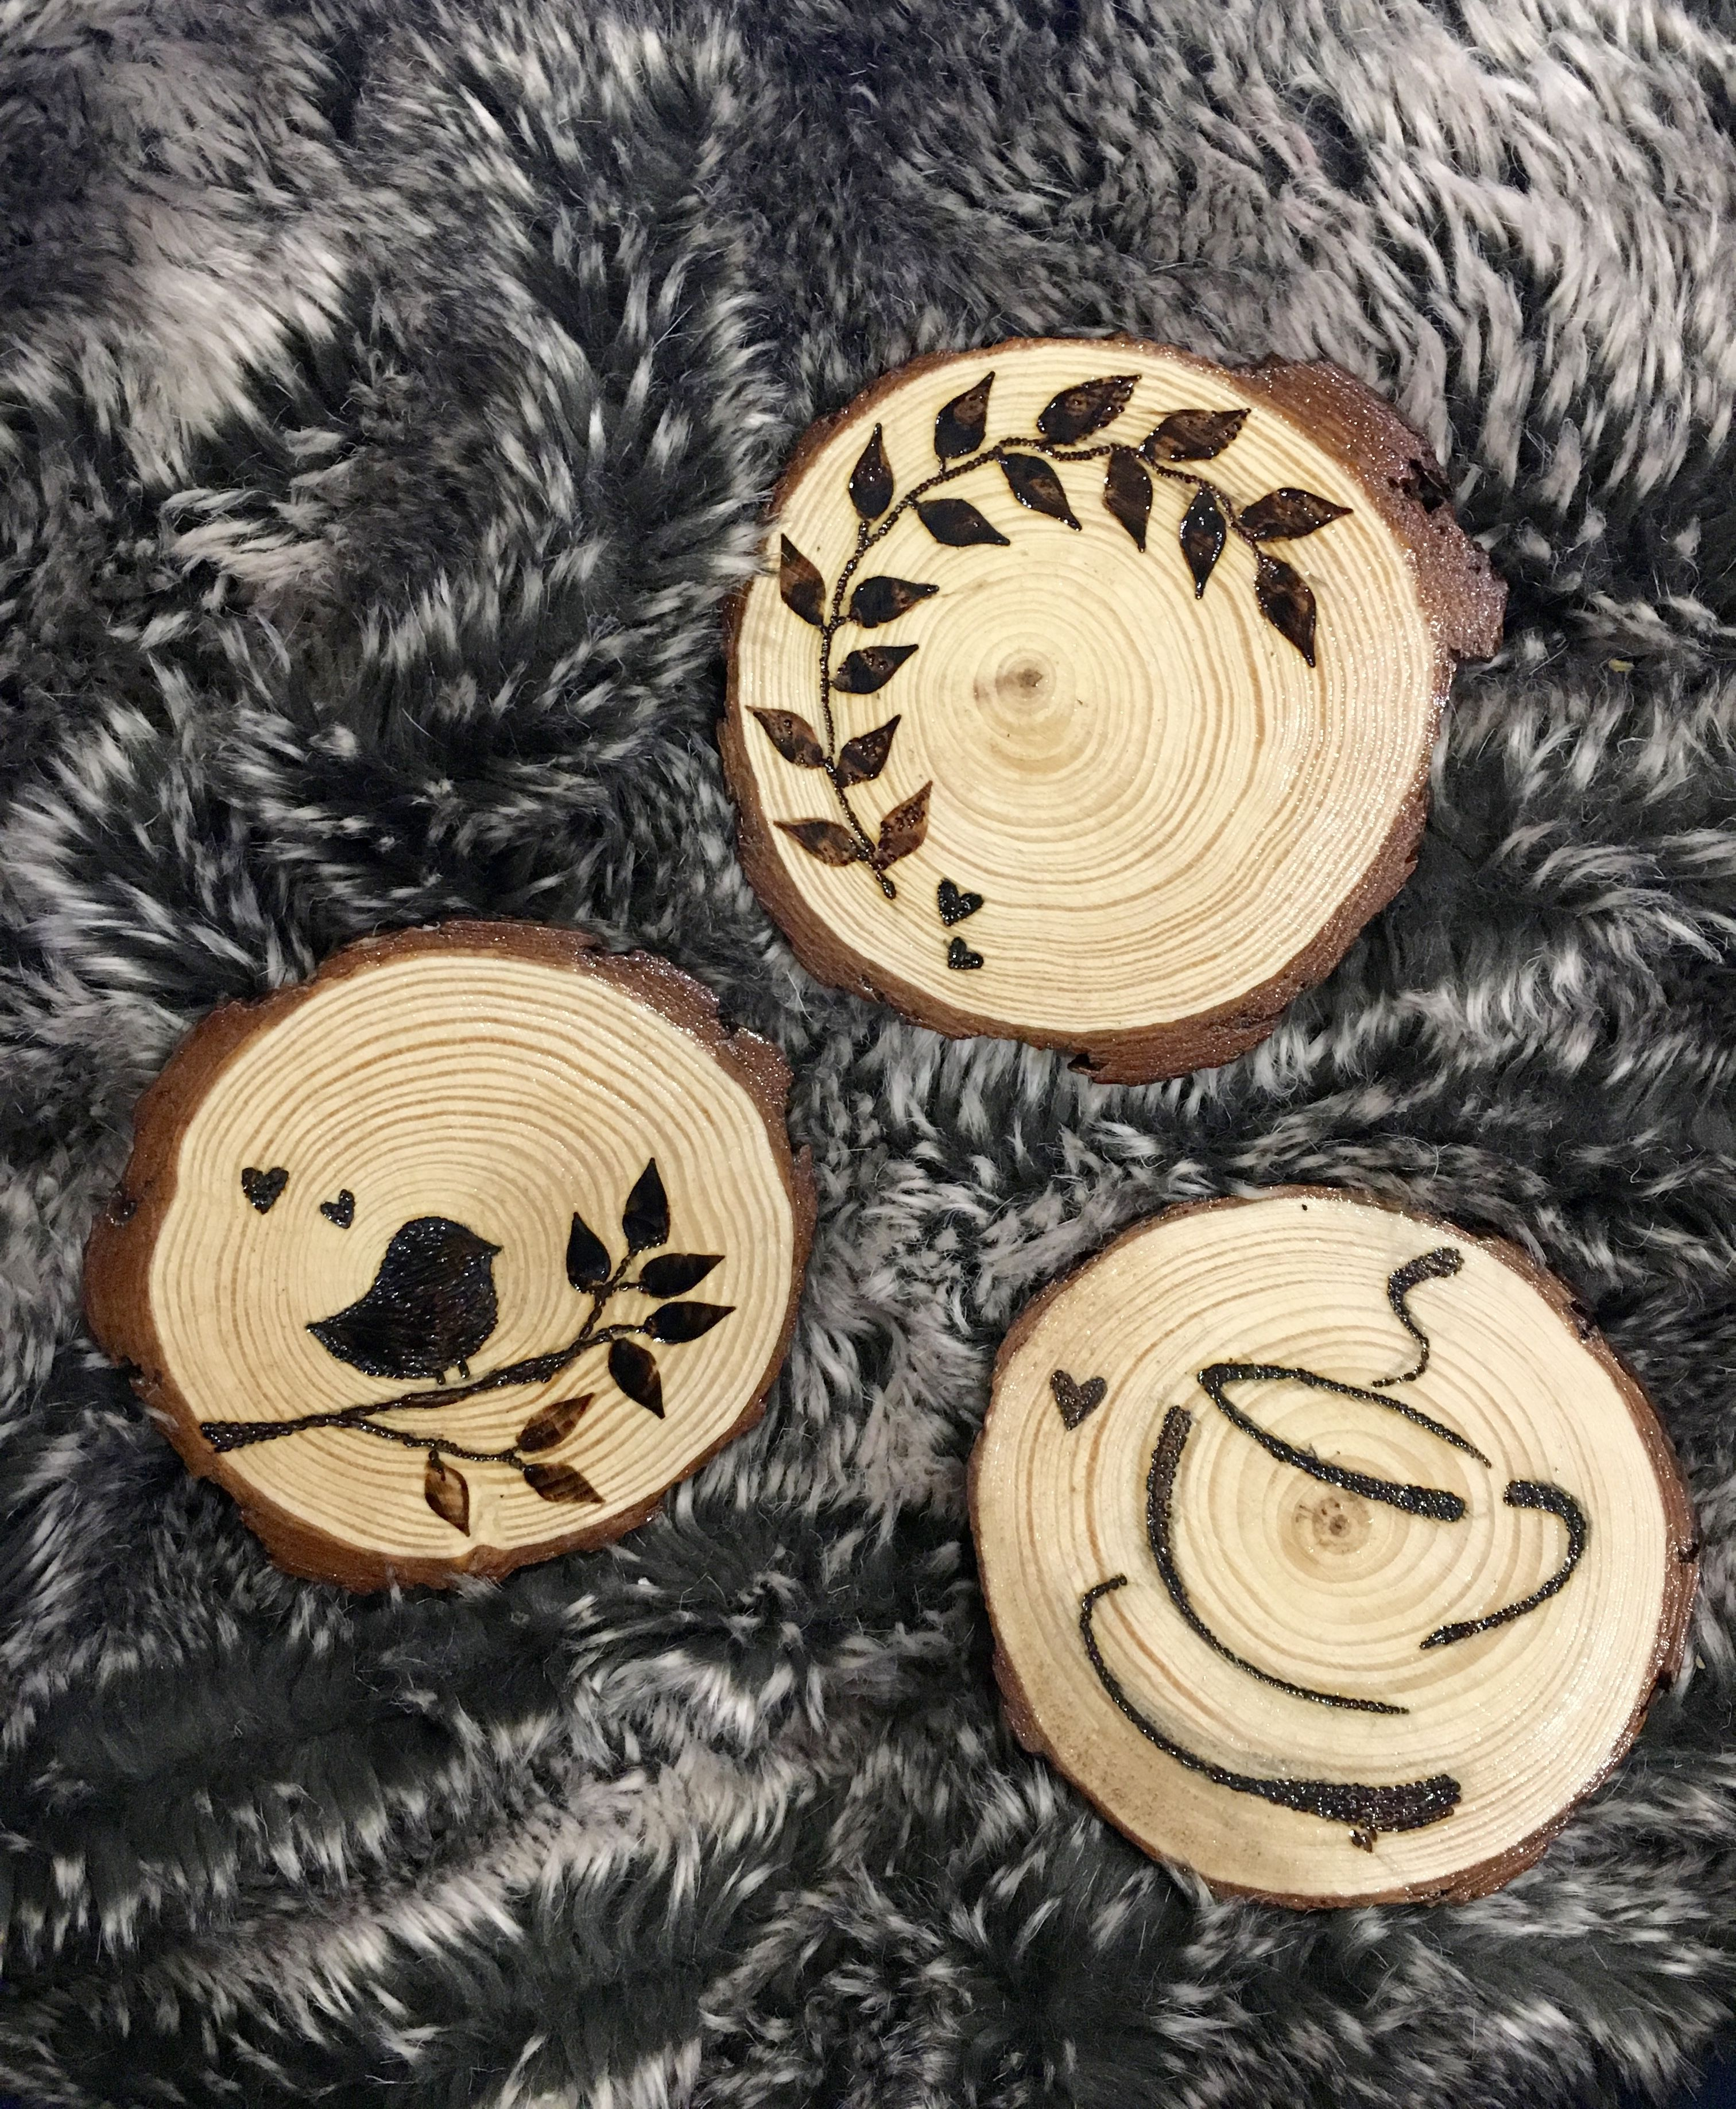 Playing With Pyrography Wood Burning Crafts Wood Jewelery Wood Burning Patterns